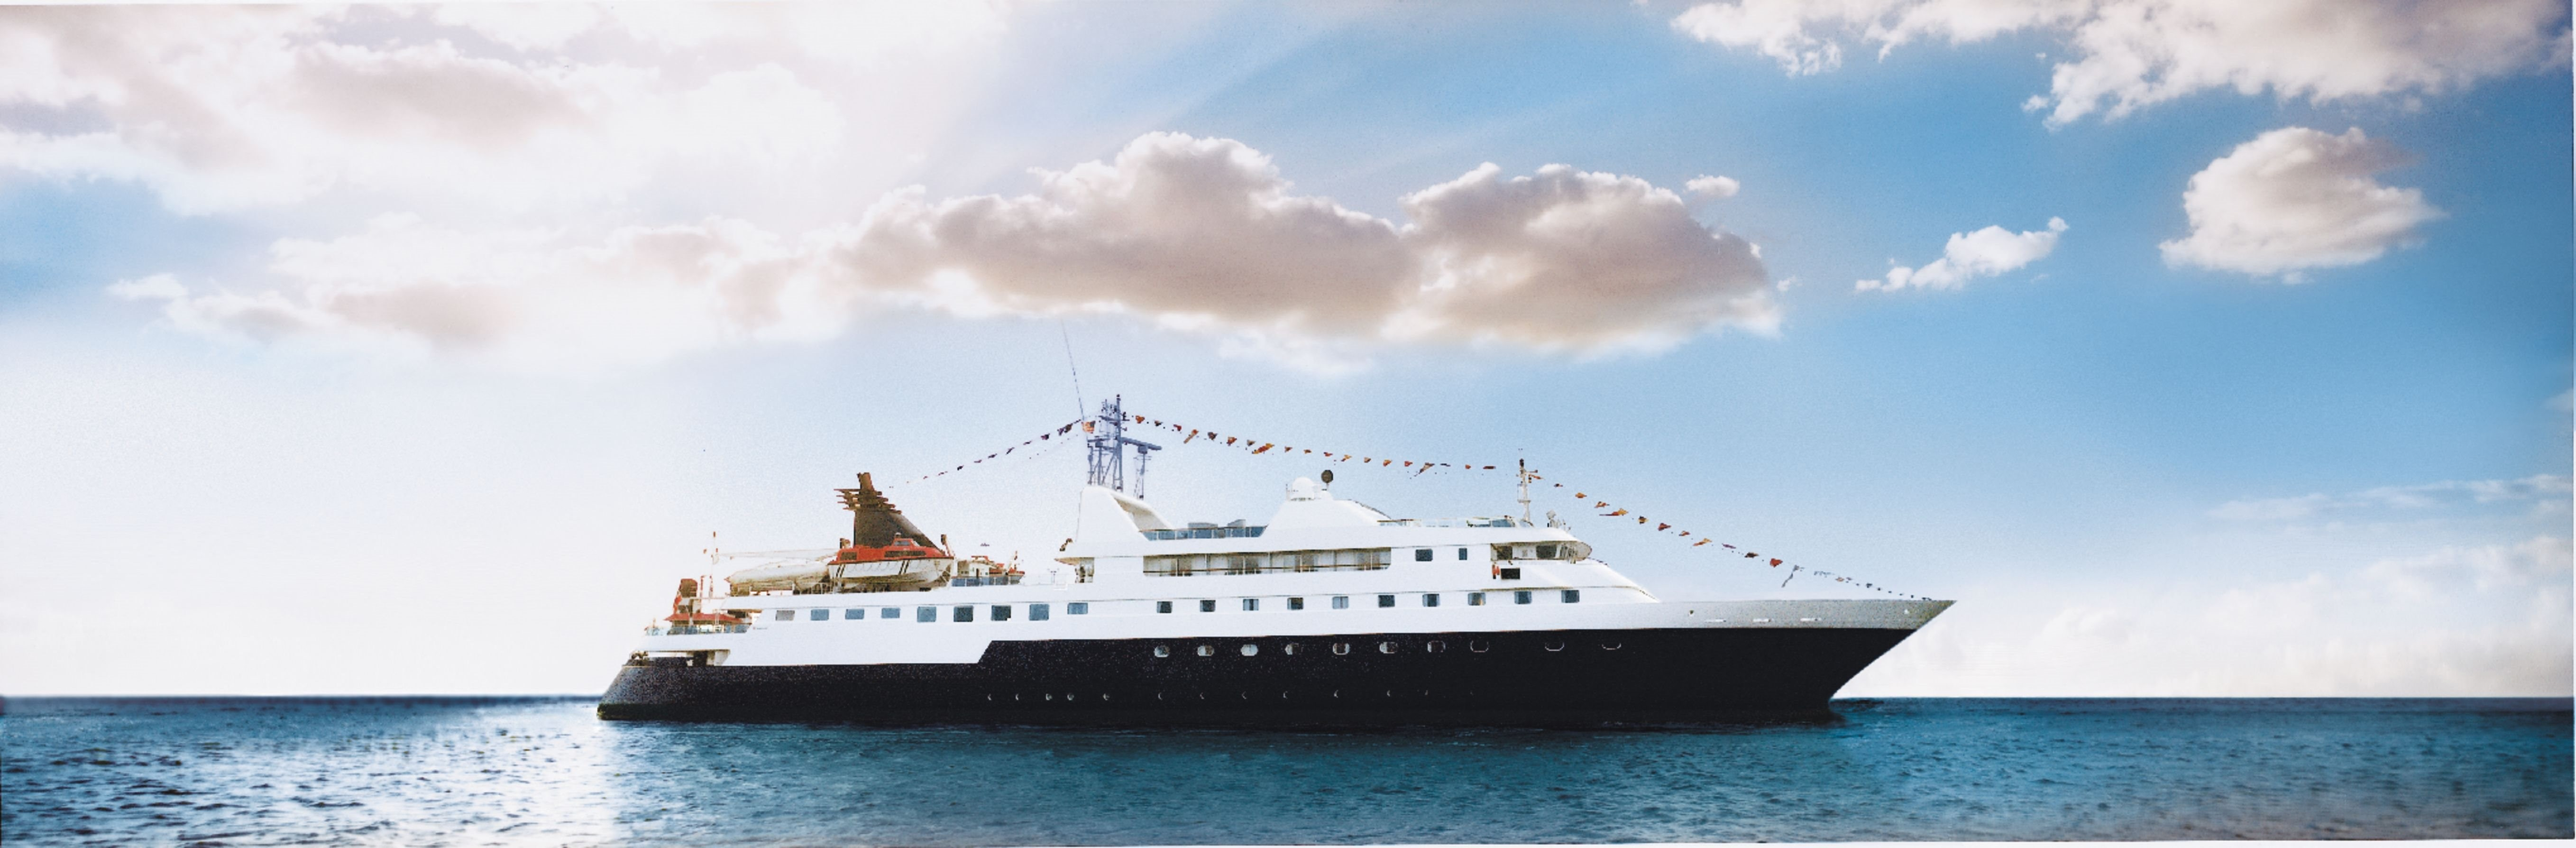 Ekvádor z Baltra na lodi Celebrity Xpedition, plavba s bonusem